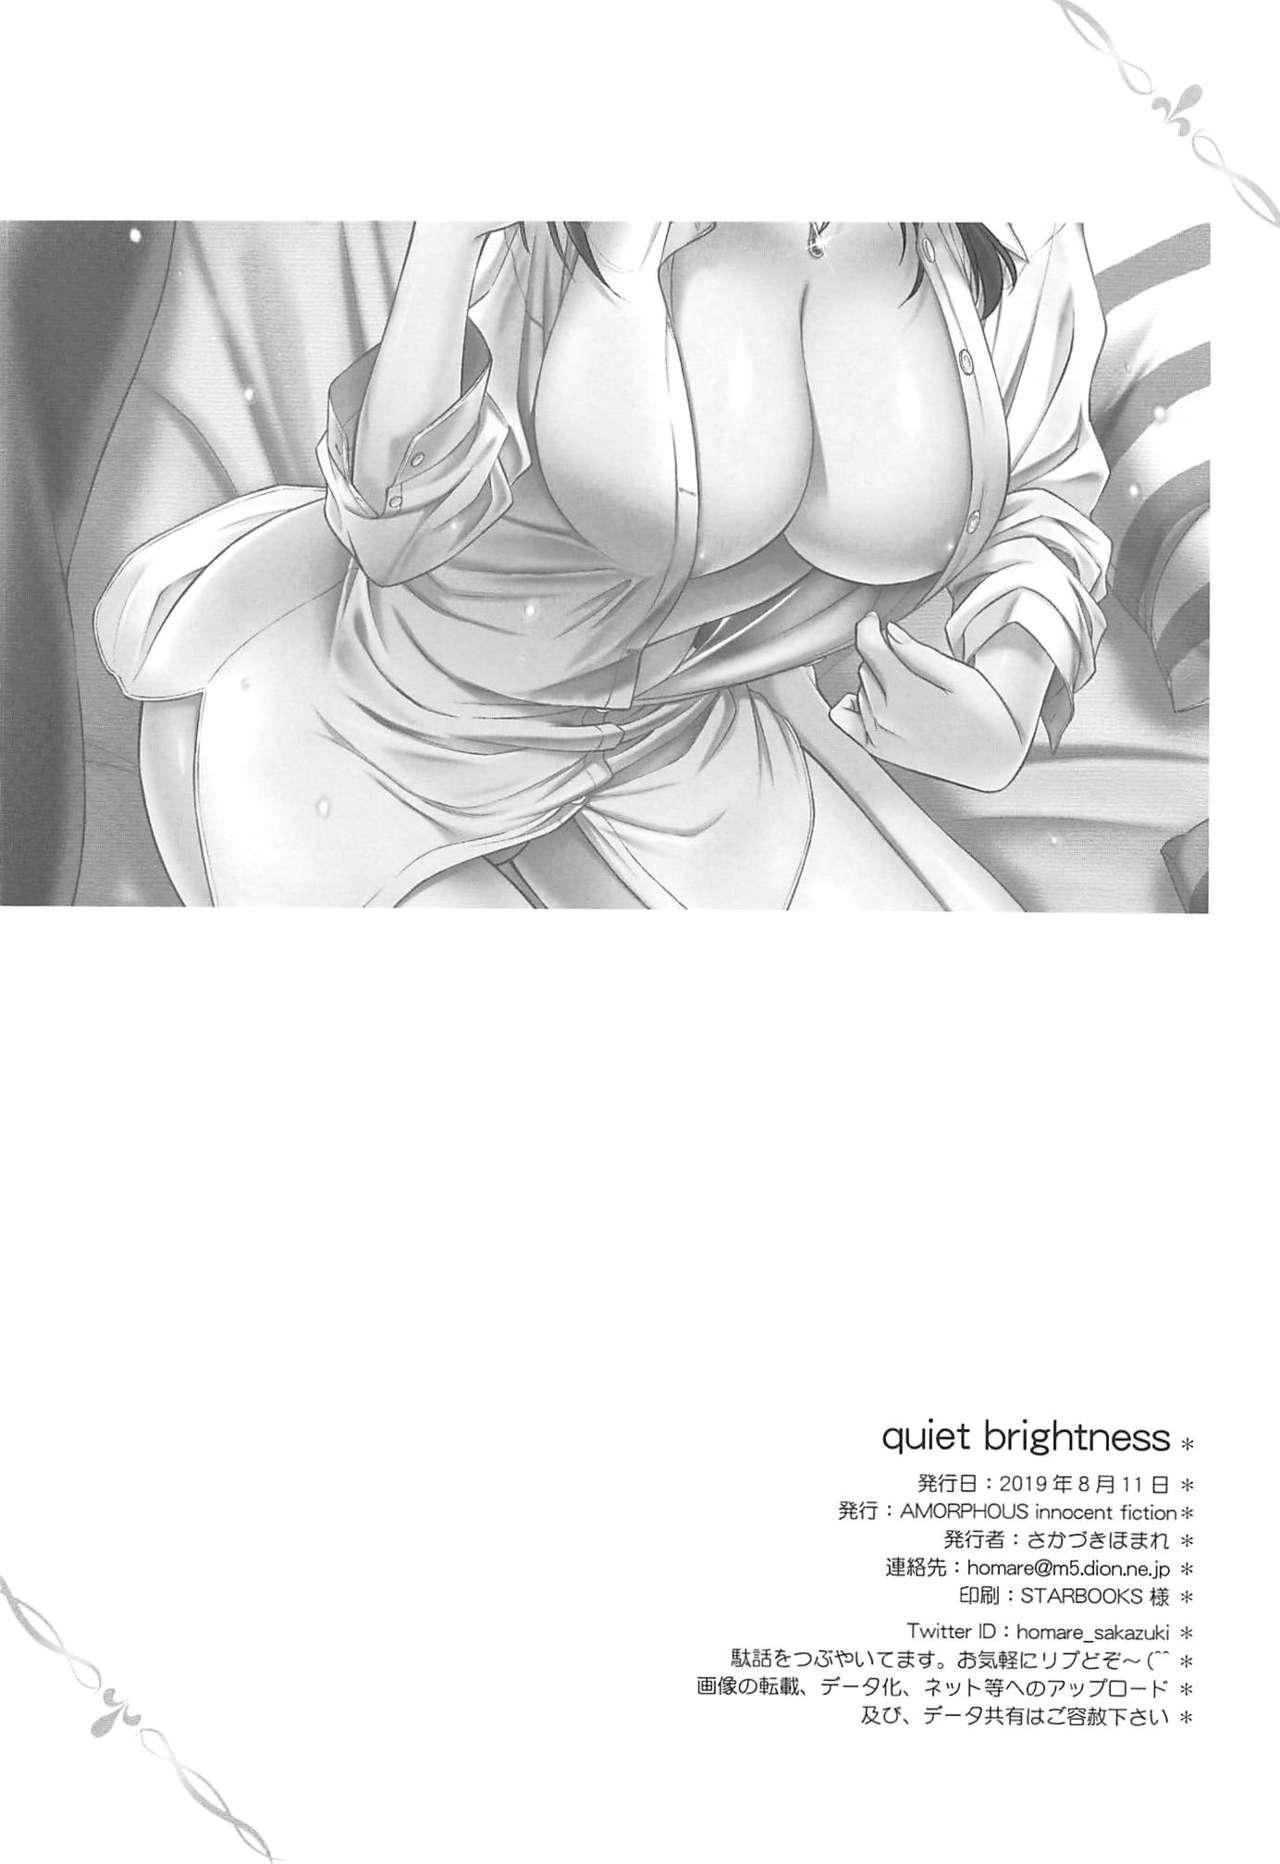 quiet brightness 16